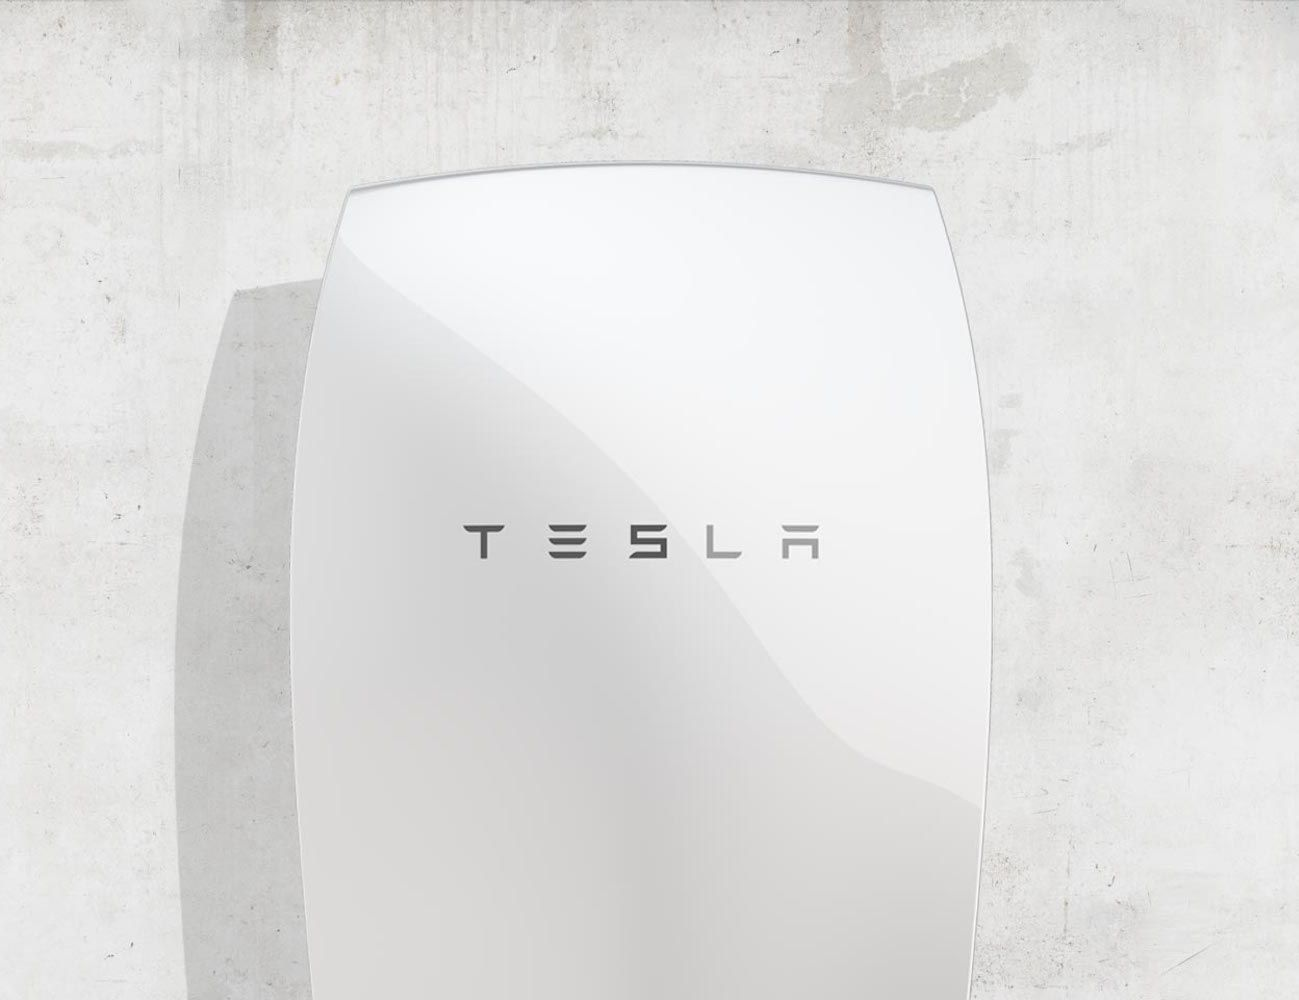 Tesla Powerwall Home Battery Tesla Powerwall Powerwall Solar Panels